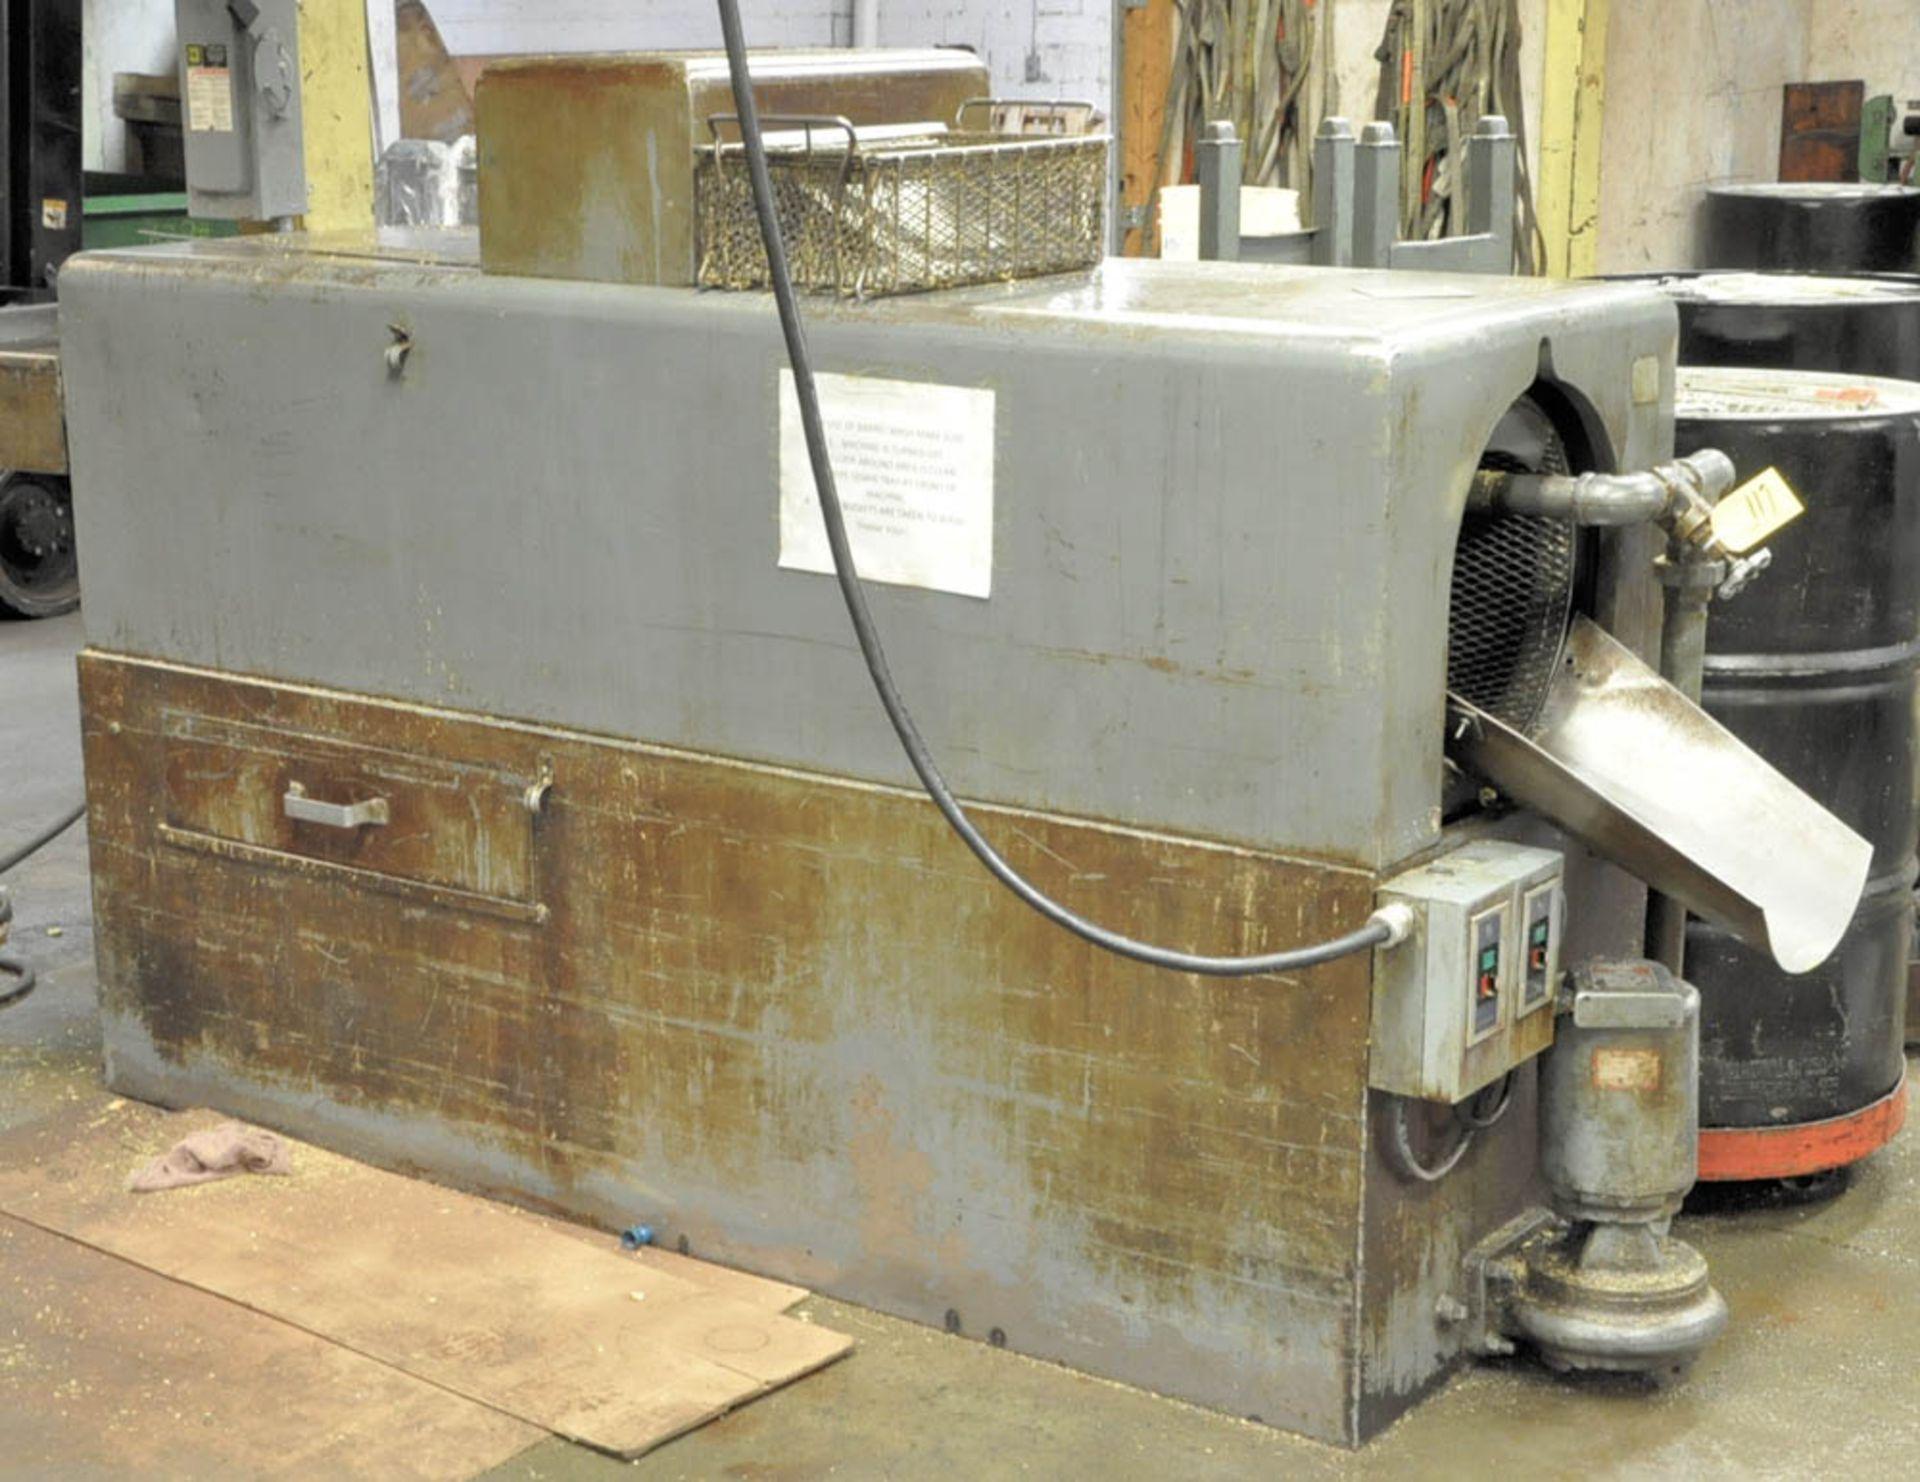 Lot 117 - ROTARY SCREW PASS THRU BARREL WASH MACHINE, S/N:N/A